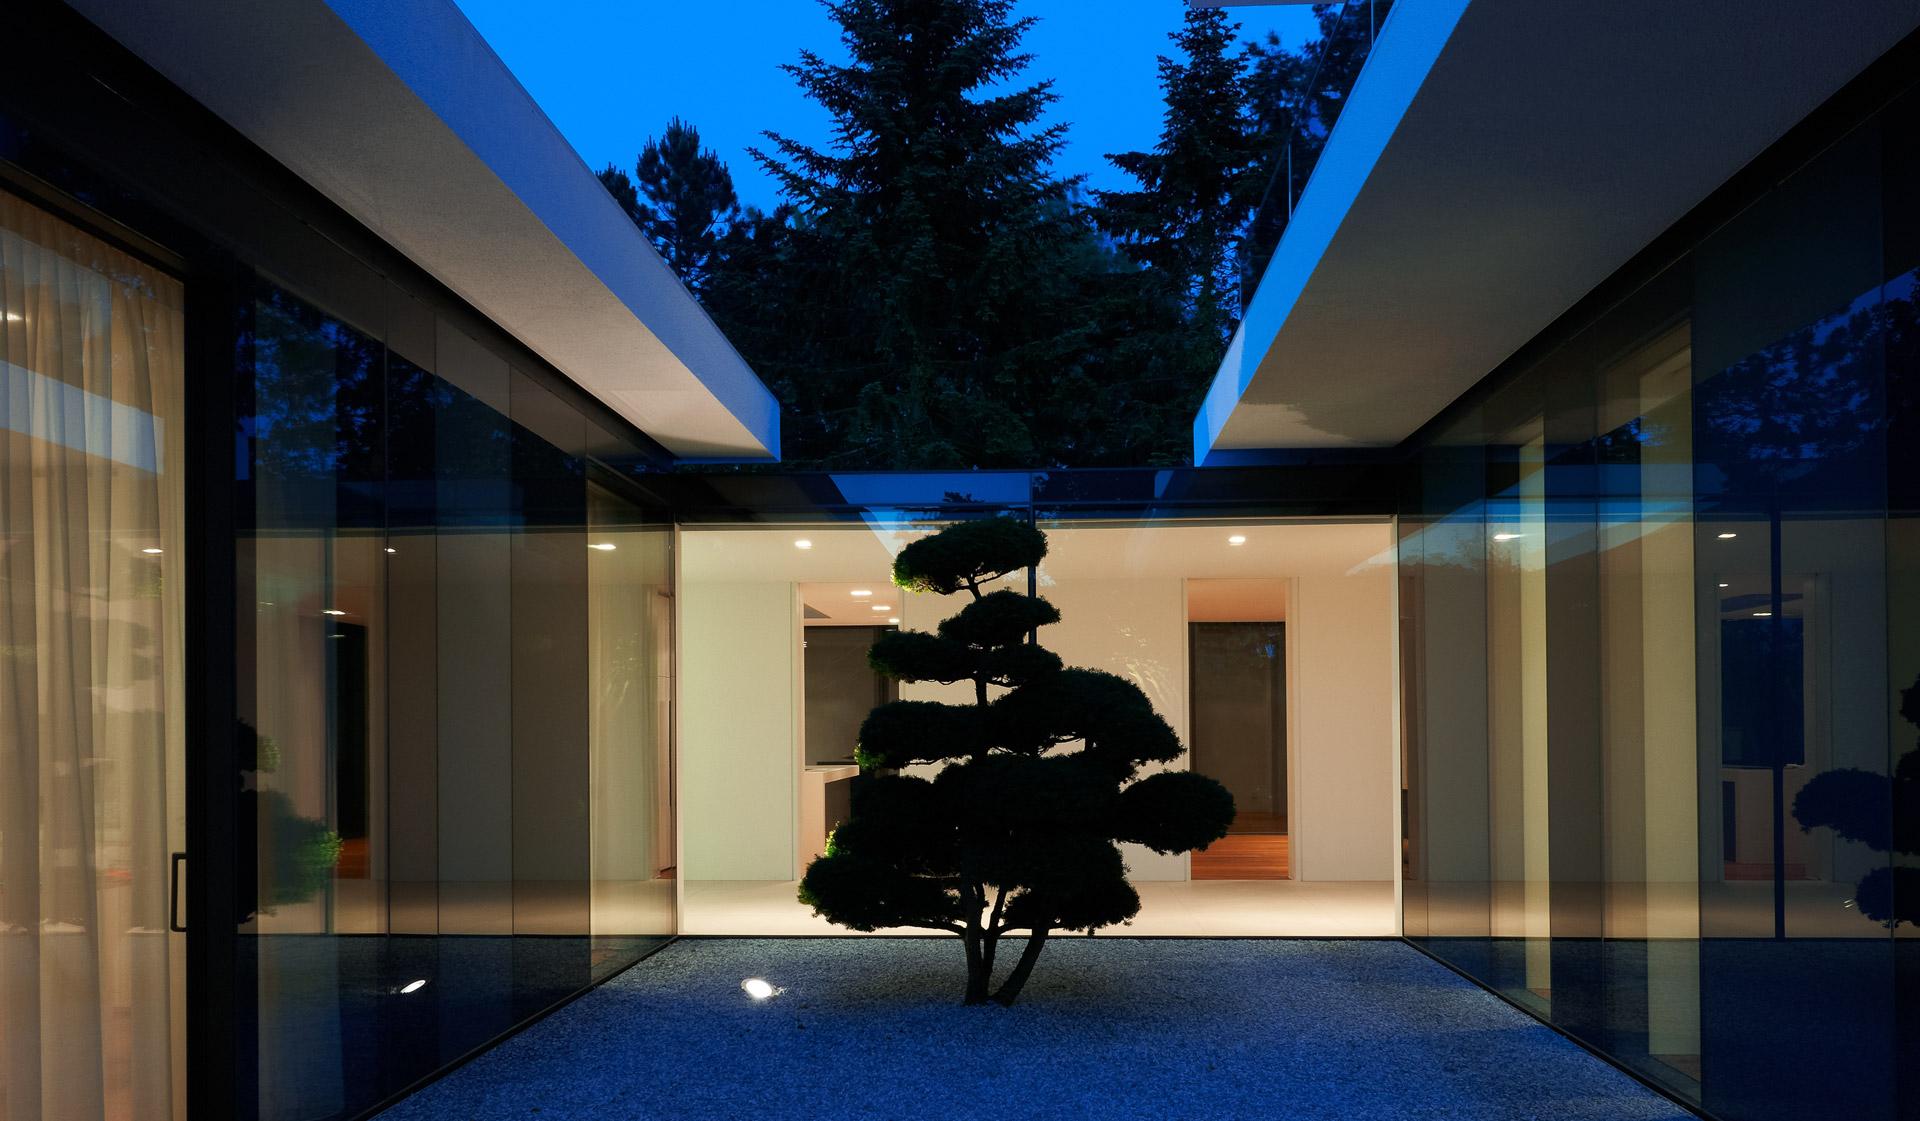 PavillonVilla in Bayern Weber Hummel Architekten 13